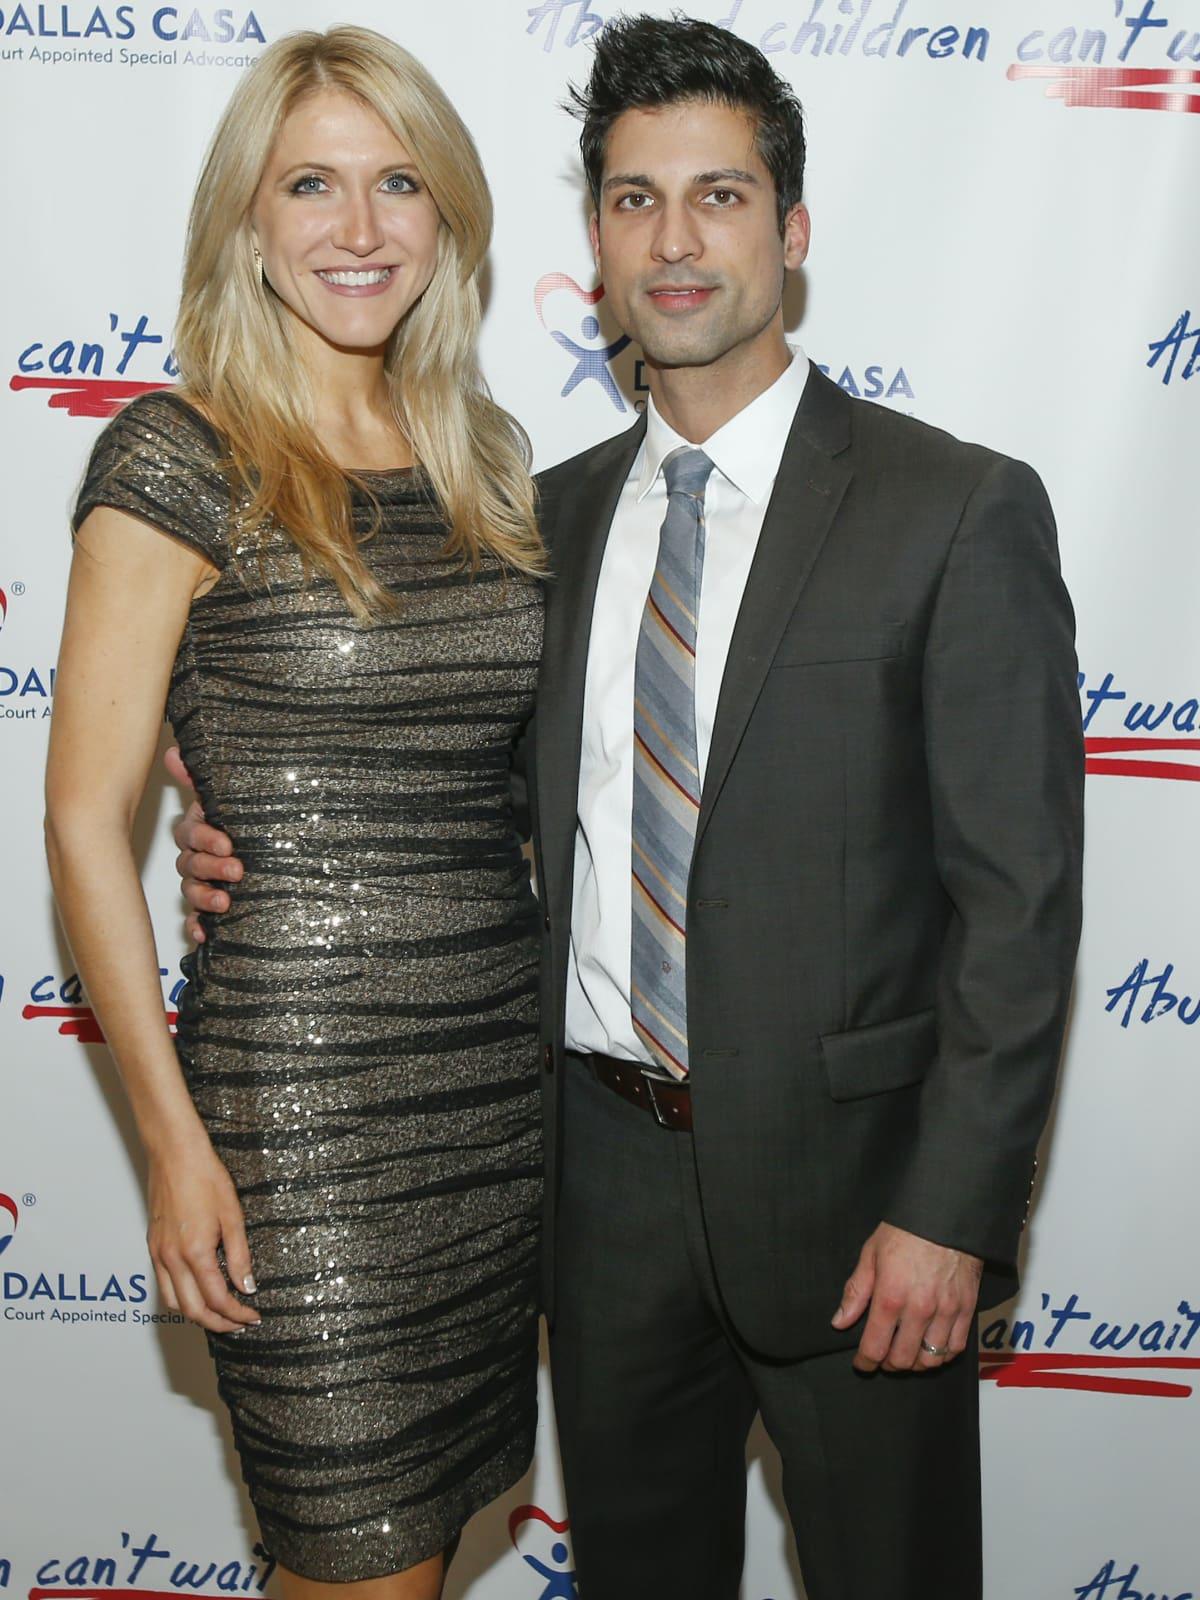 Farid and Jennifer Dharamsi